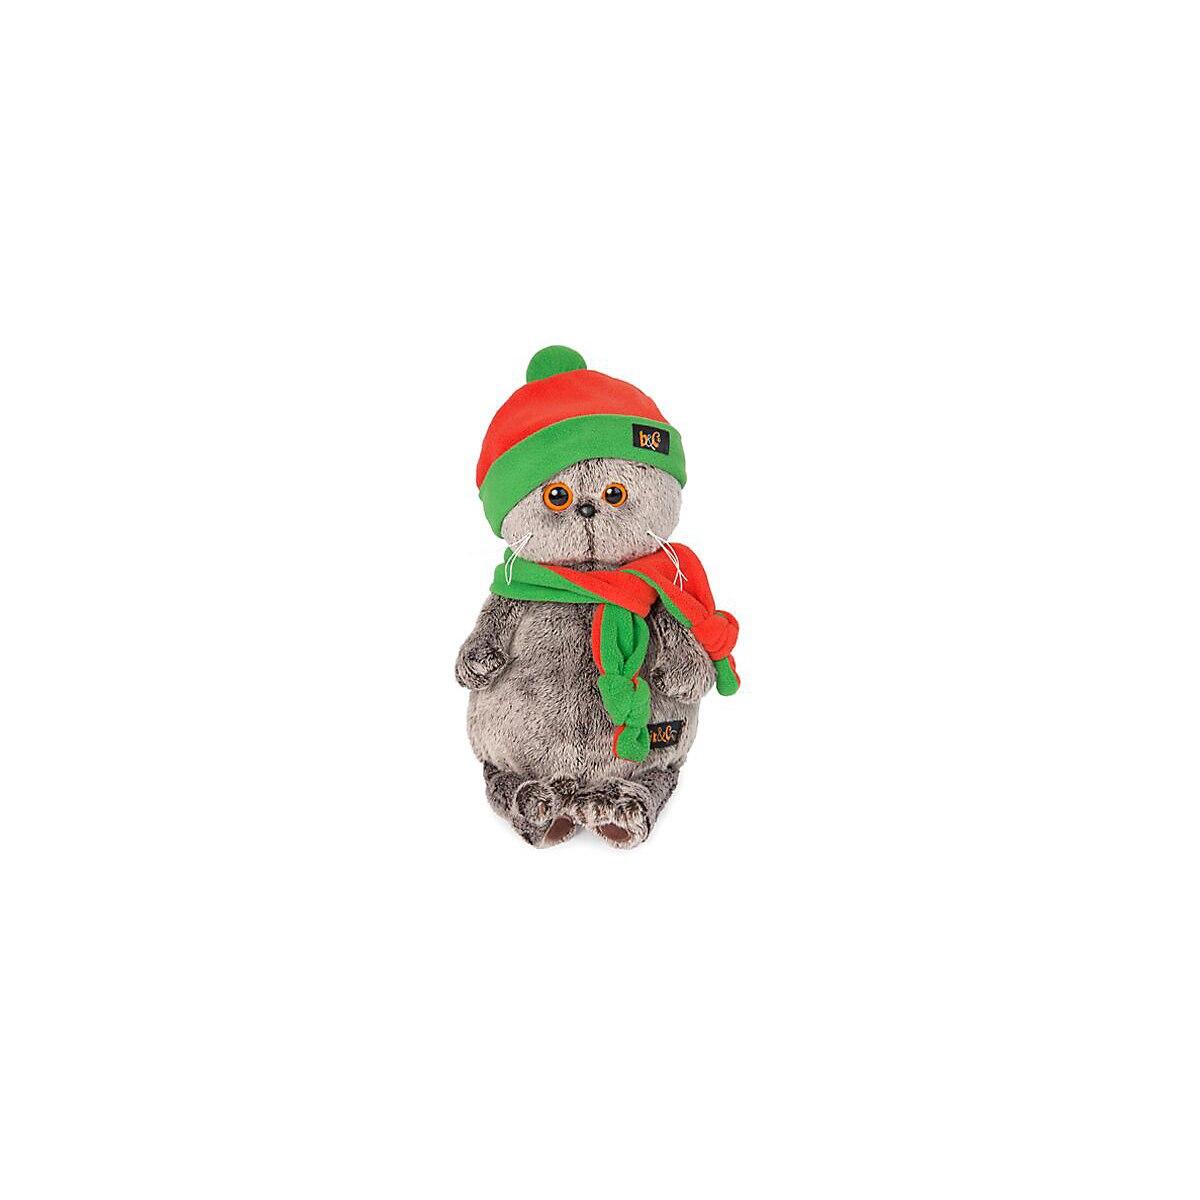 BUDI BASA Stuffed & Plush Animais 10733085 brinquedo macio amigo animais menina menino jogar jogo meninas meninos MTpromo